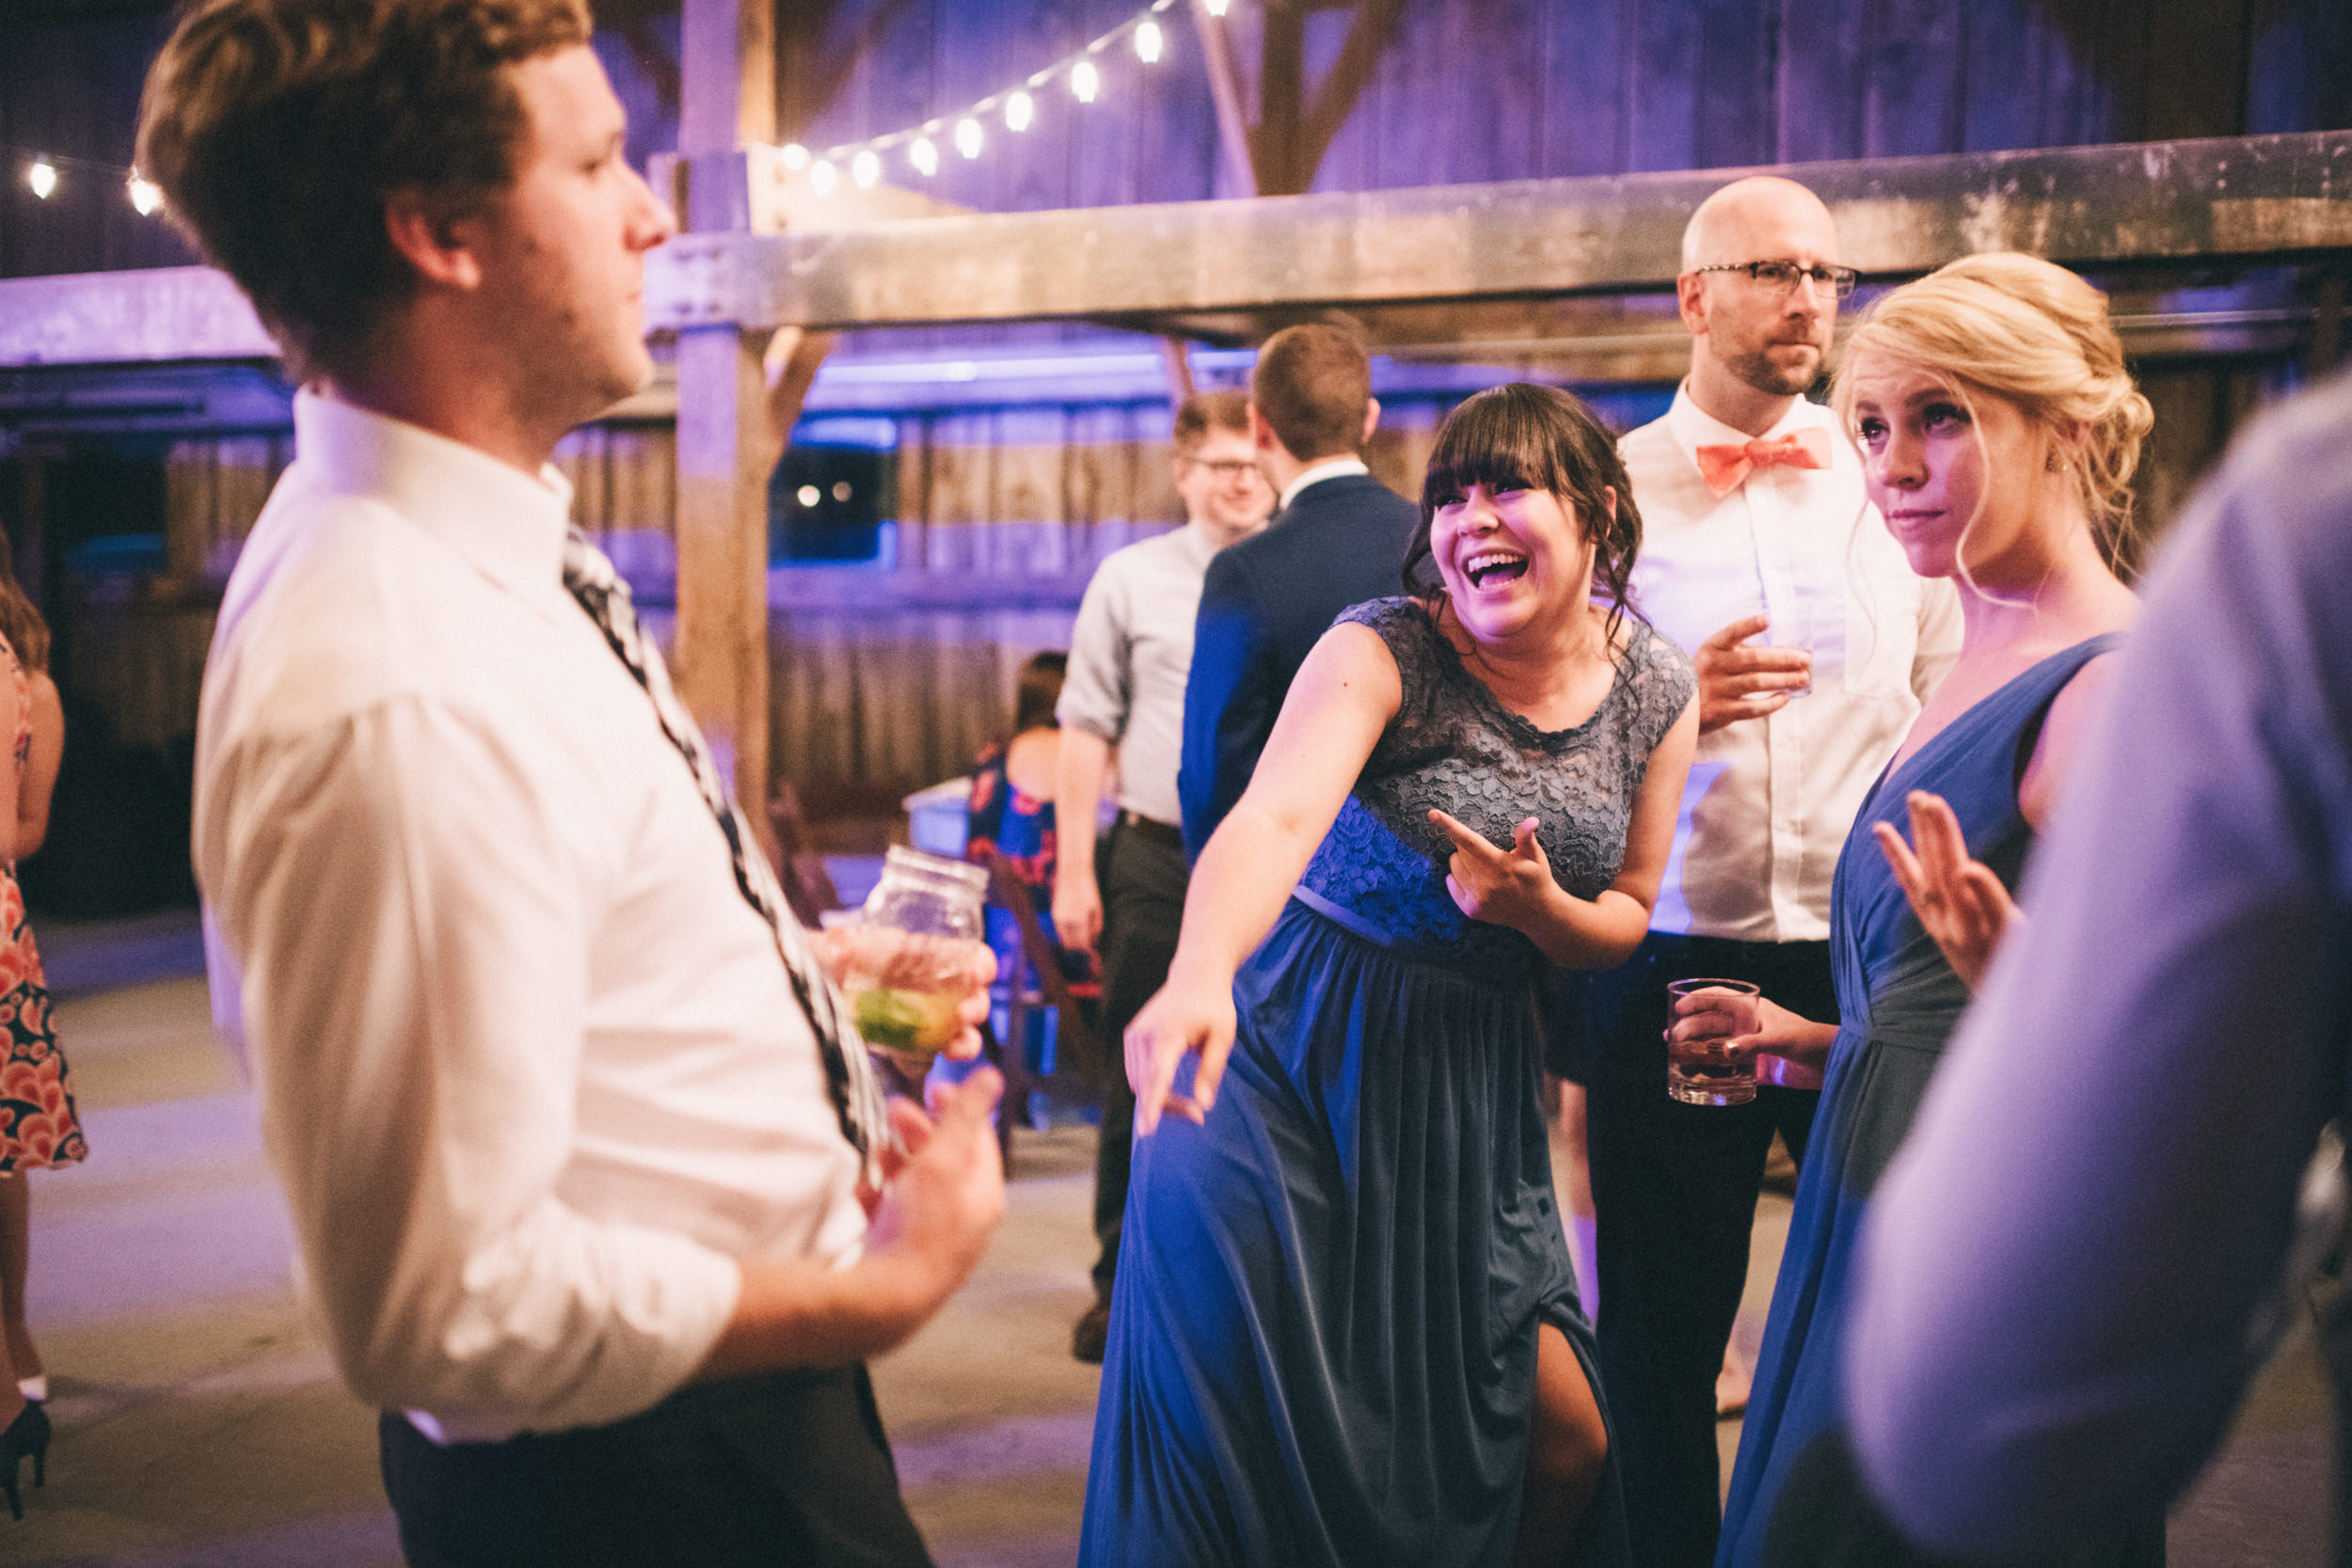 Louisville-Kentucky-Wedding-and-Elopement-Photographer-Sarah-Katherine-Davis-Photography-Summer-Jewel-Toned-Wedding-Chineese-Tea-Ceremony-Warrenwood-Manor-Danville-983.jpg